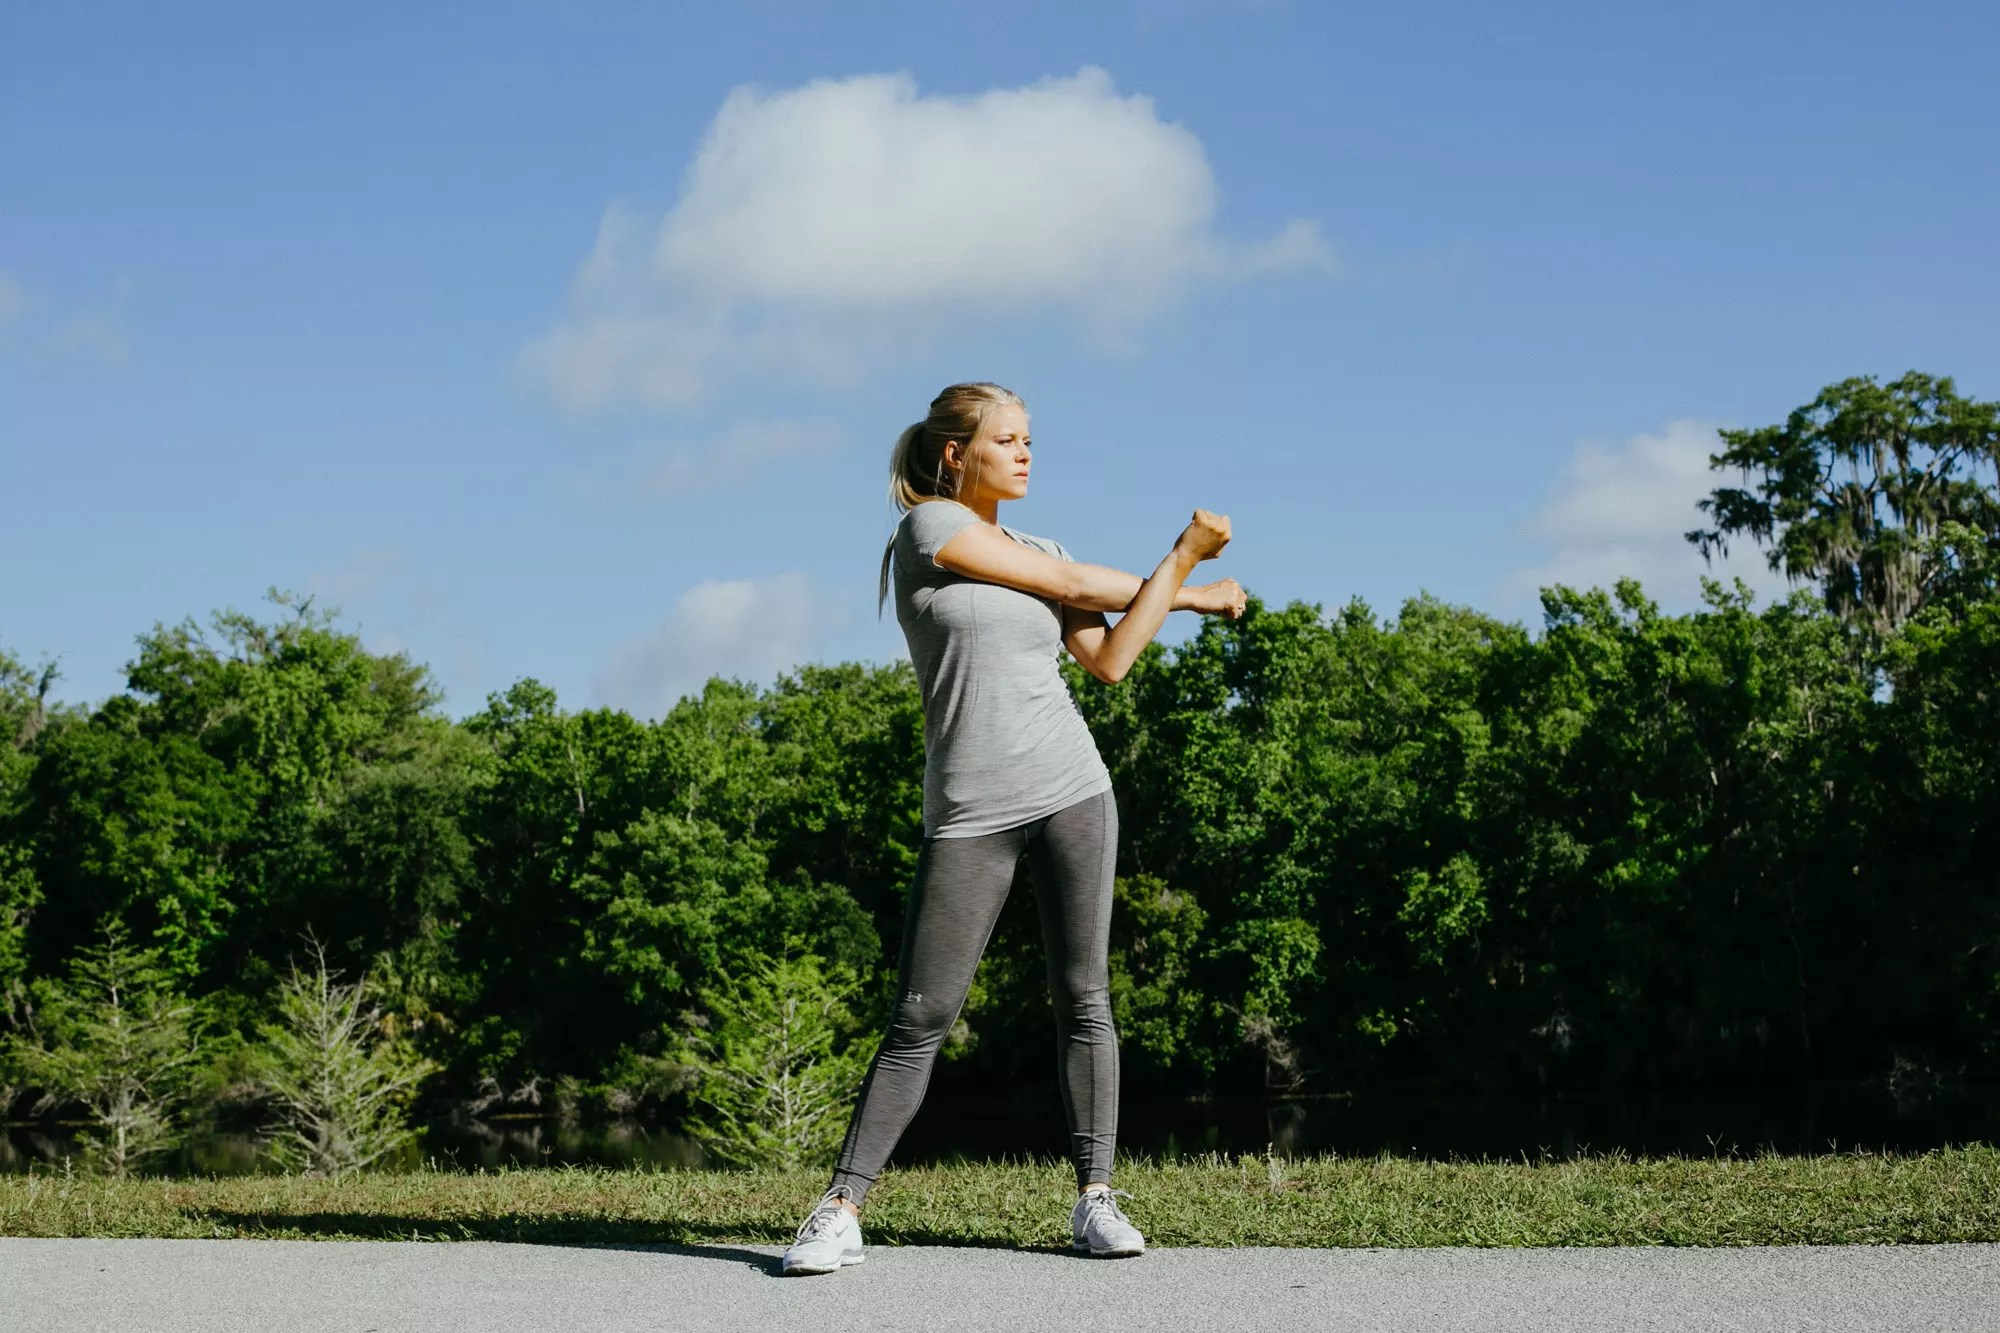 Can Olympic Athletes Use CBD?